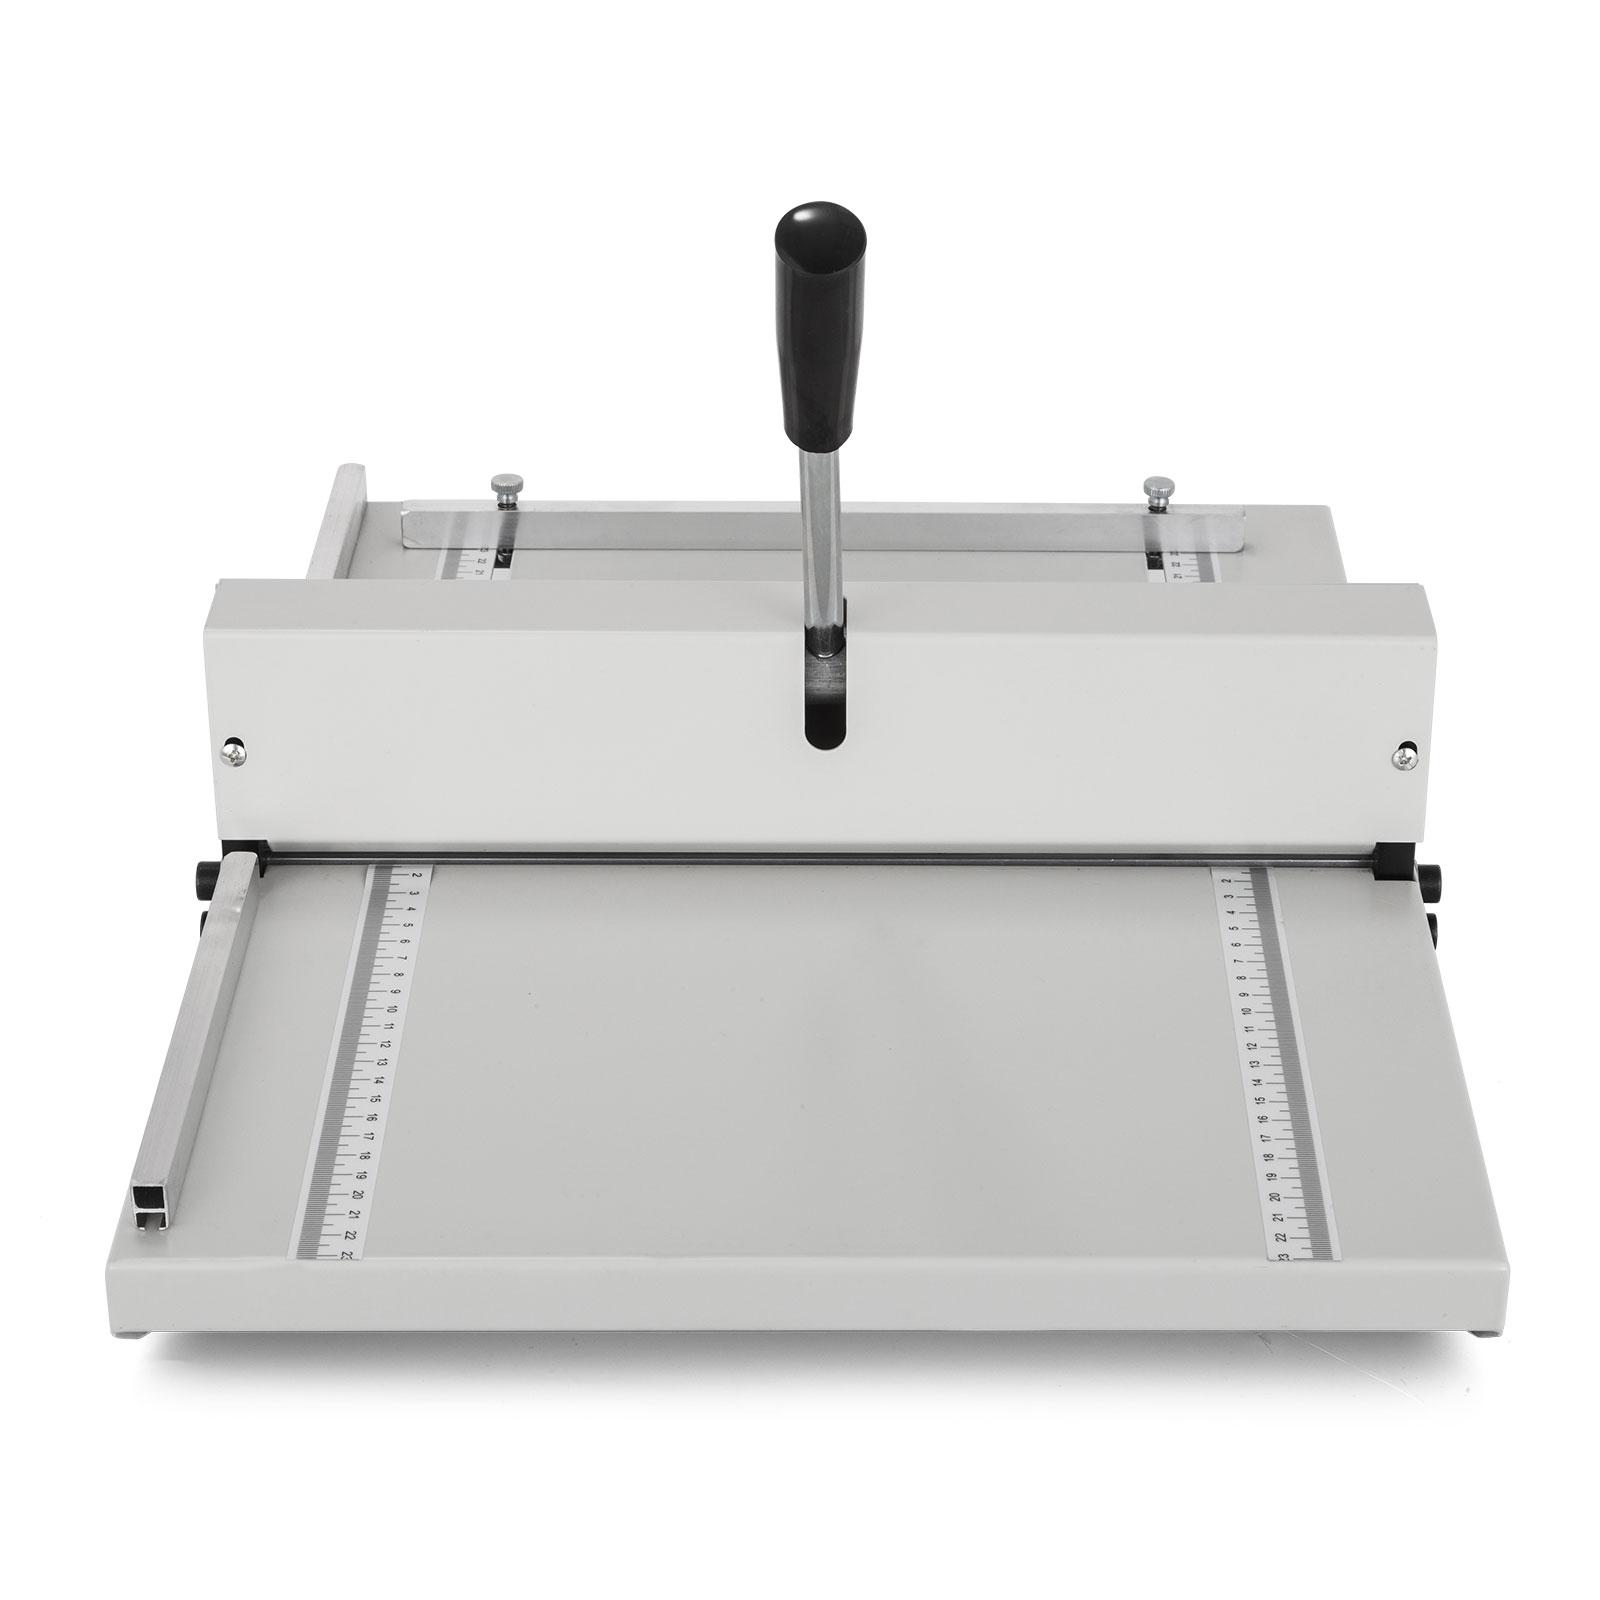 Cordonatrice-Perforatrice-Max-350-520mm-Profondita-Regolabile-Elettrica-Manuale miniatura 65